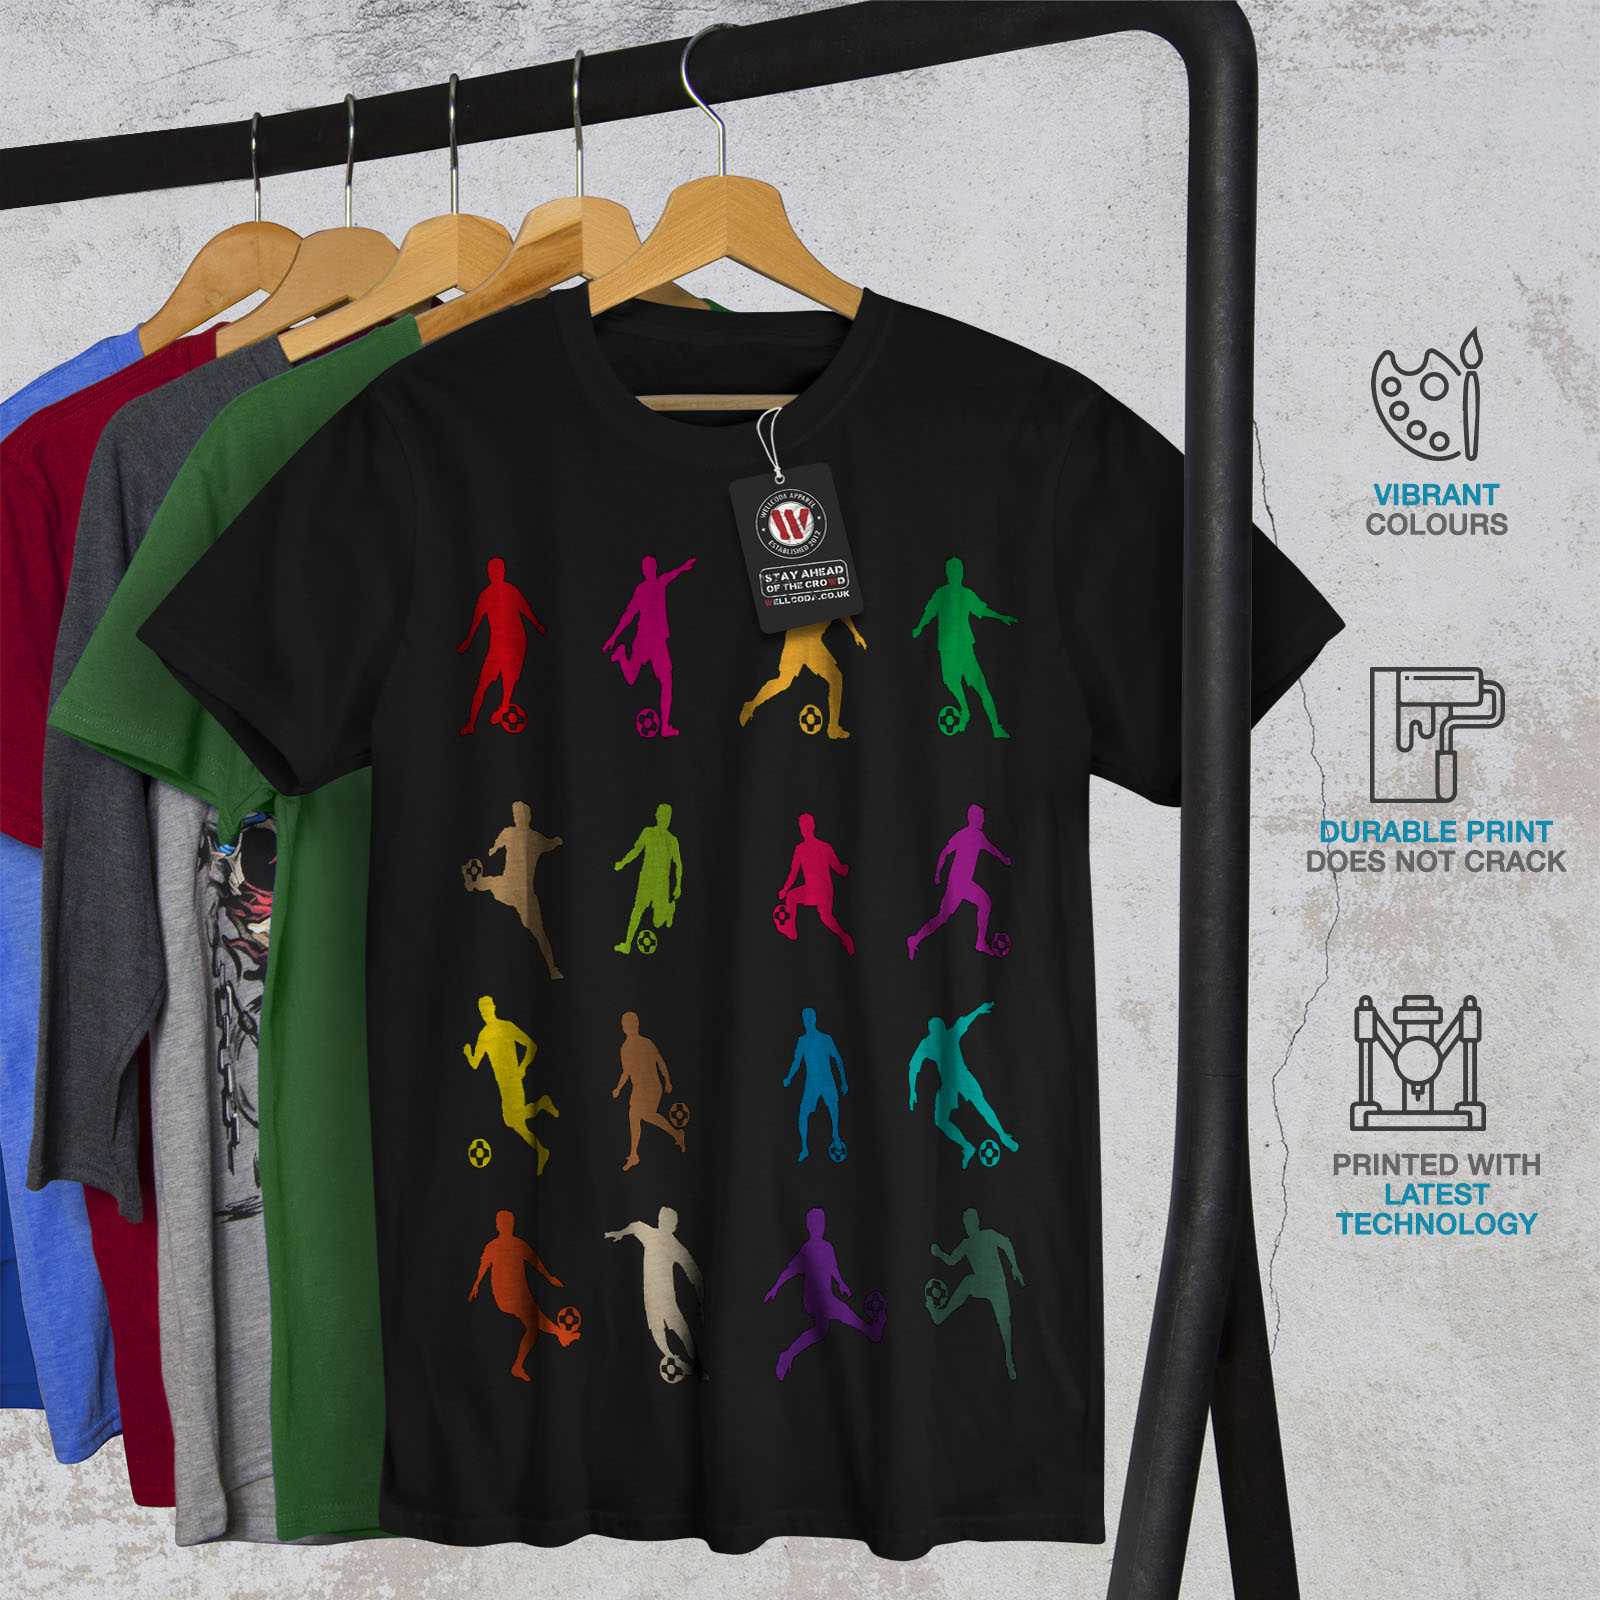 Ball Graphic Design Printed Tee Wellcoda Football Game Sport Mens T-shirt